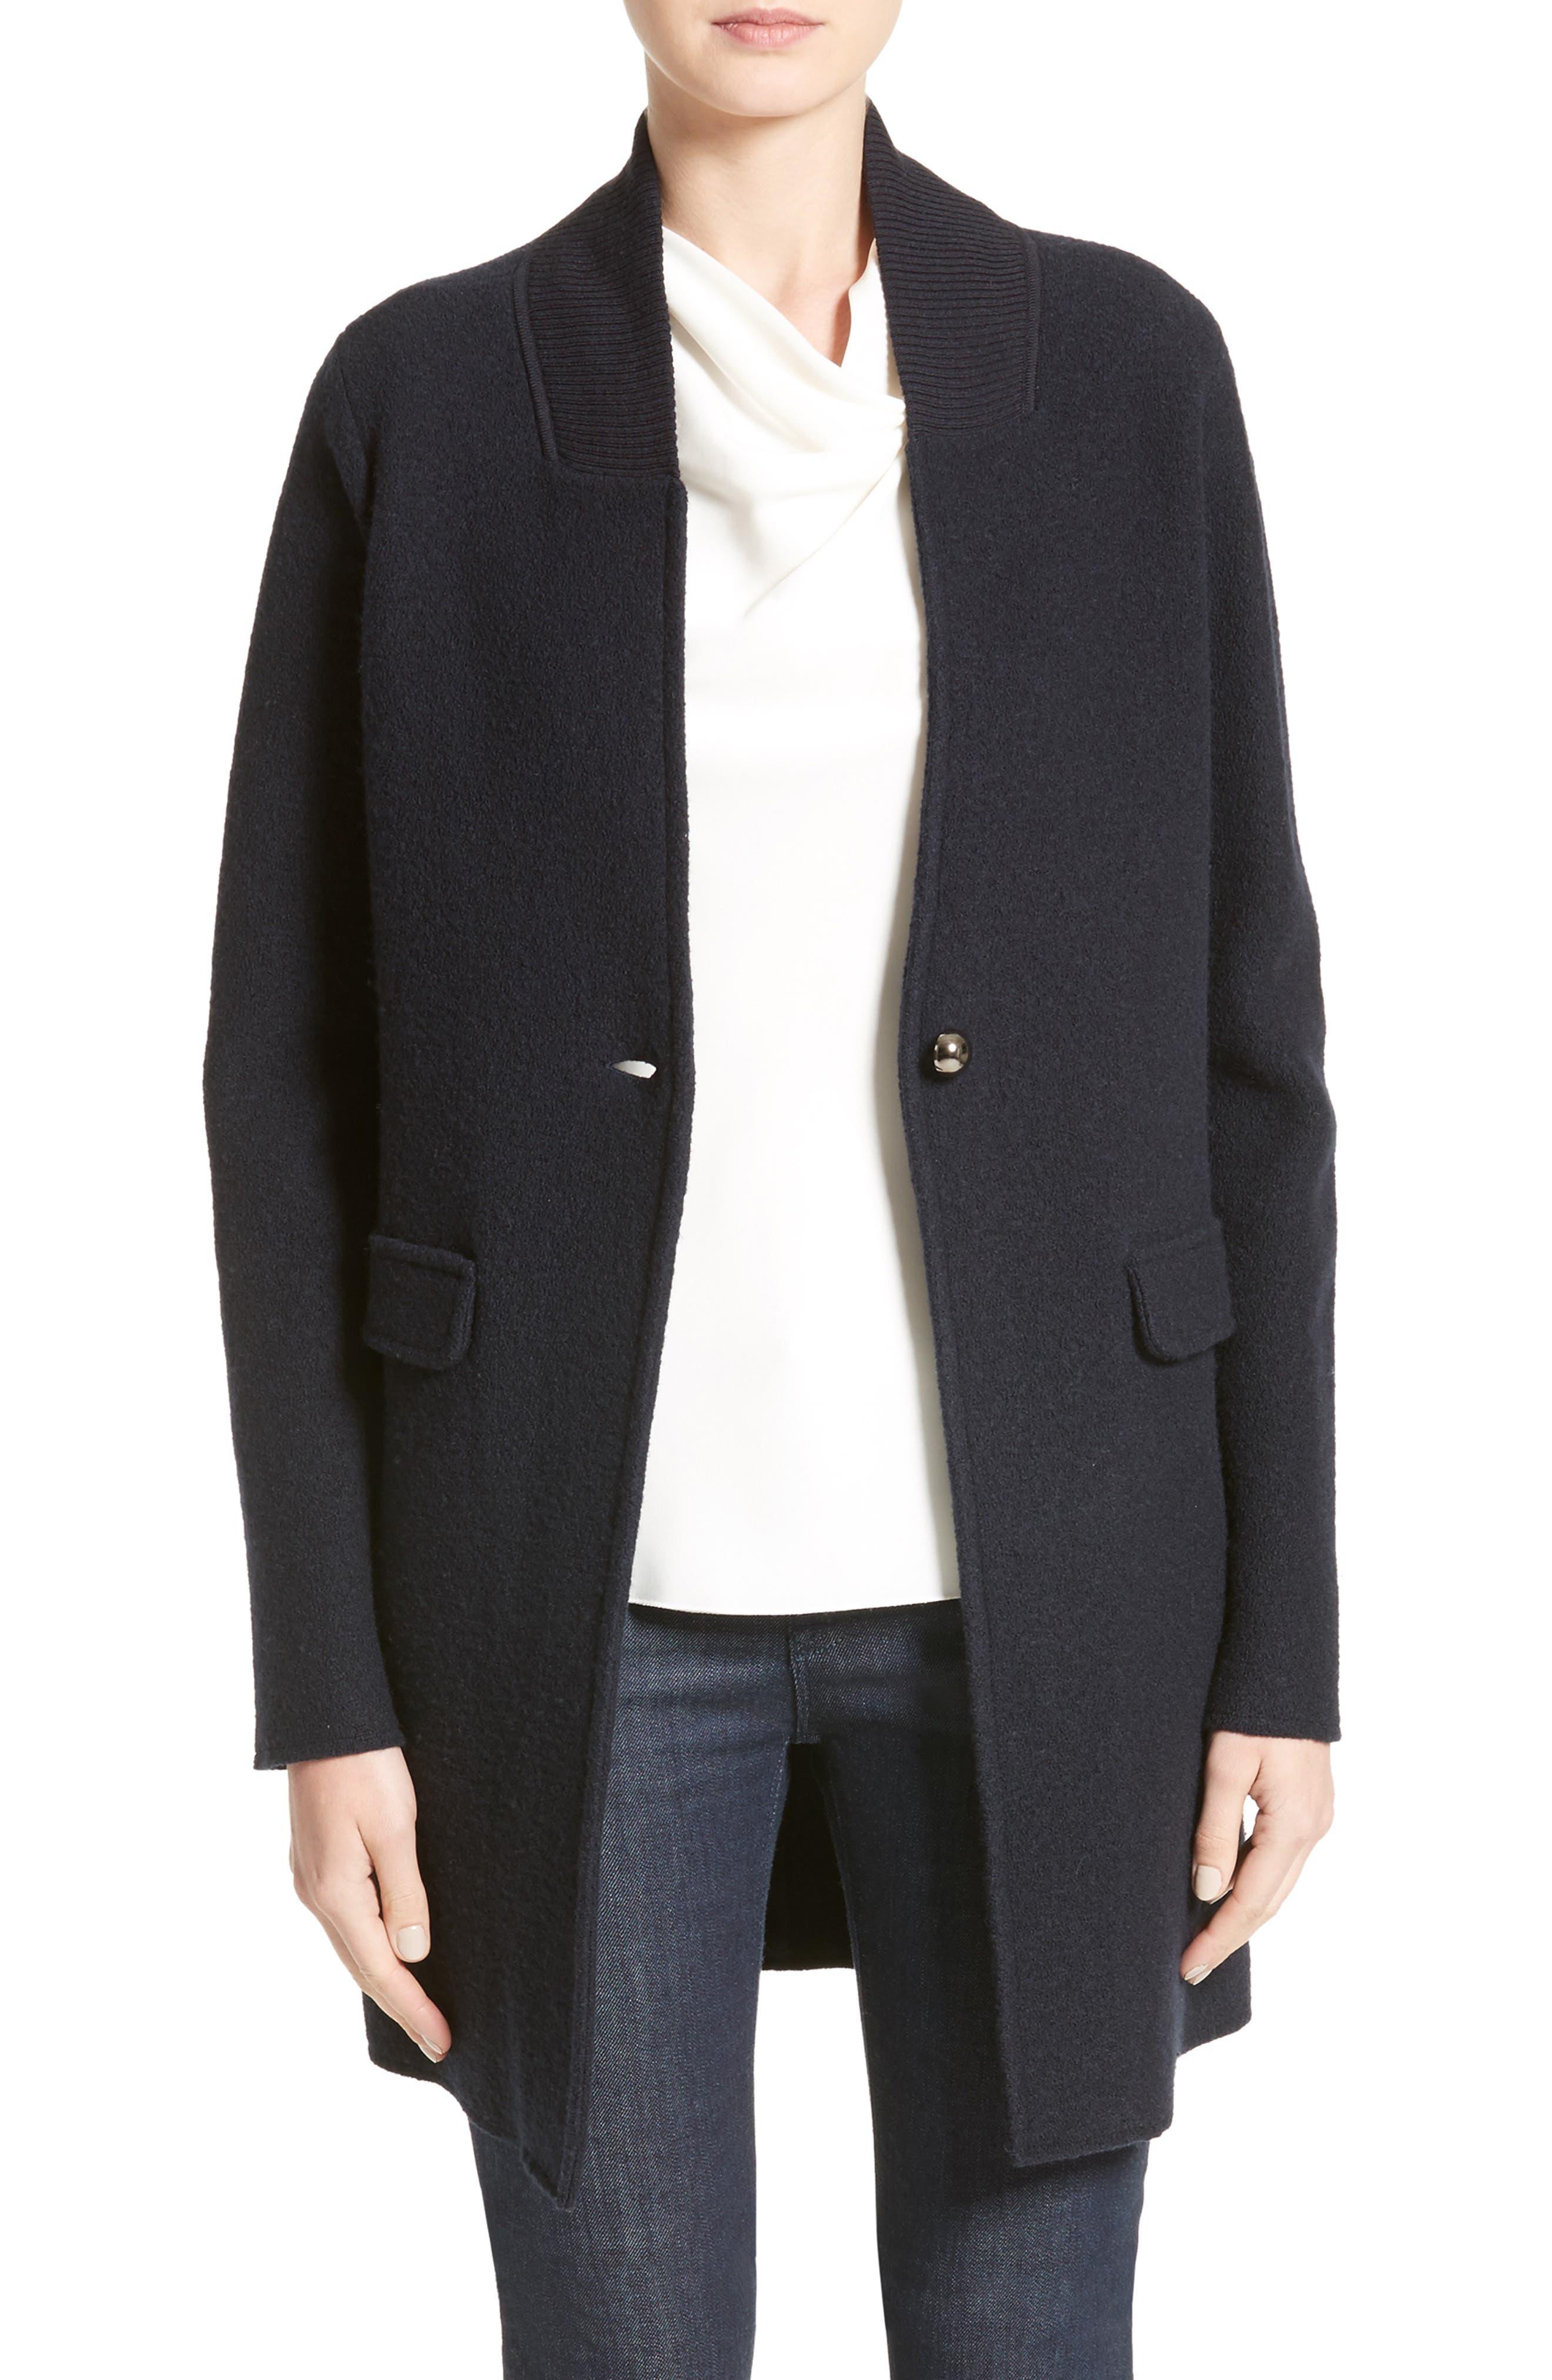 Armani Jeans Single Button Wool Coat,                             Main thumbnail 1, color,                             484